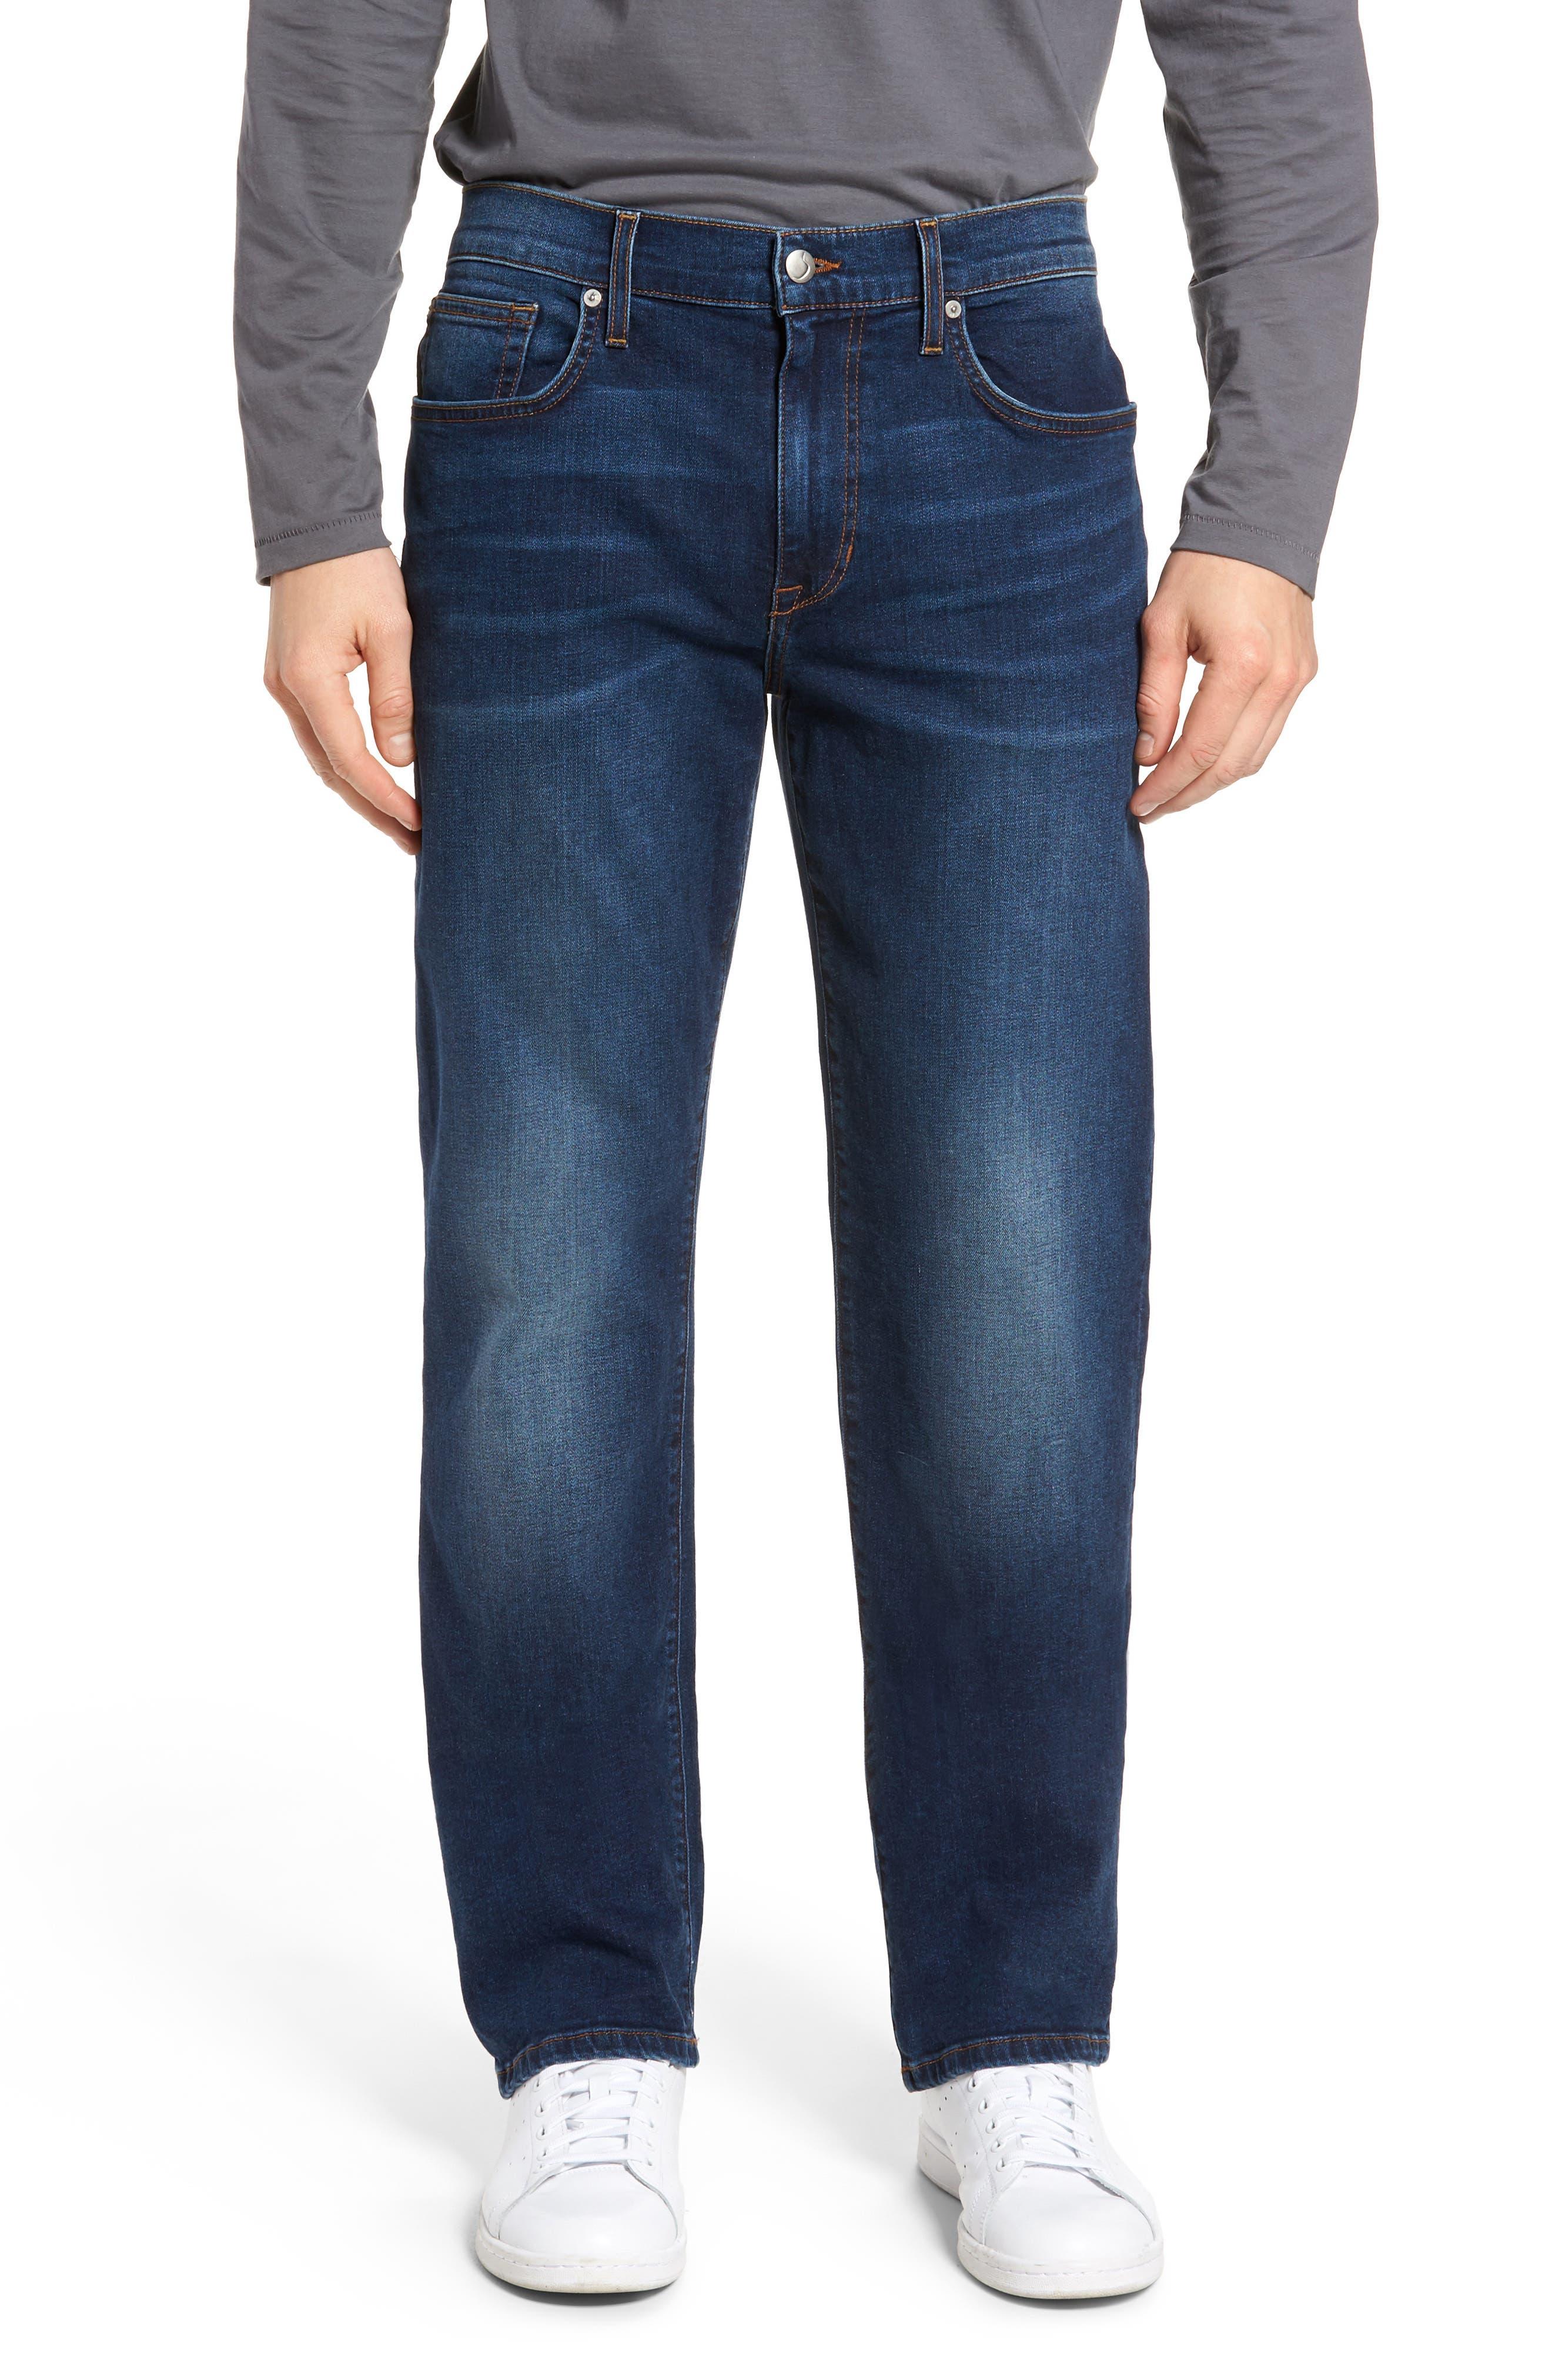 Brixton Slim Straight Leg Jeans,                             Main thumbnail 1, color,                             Line